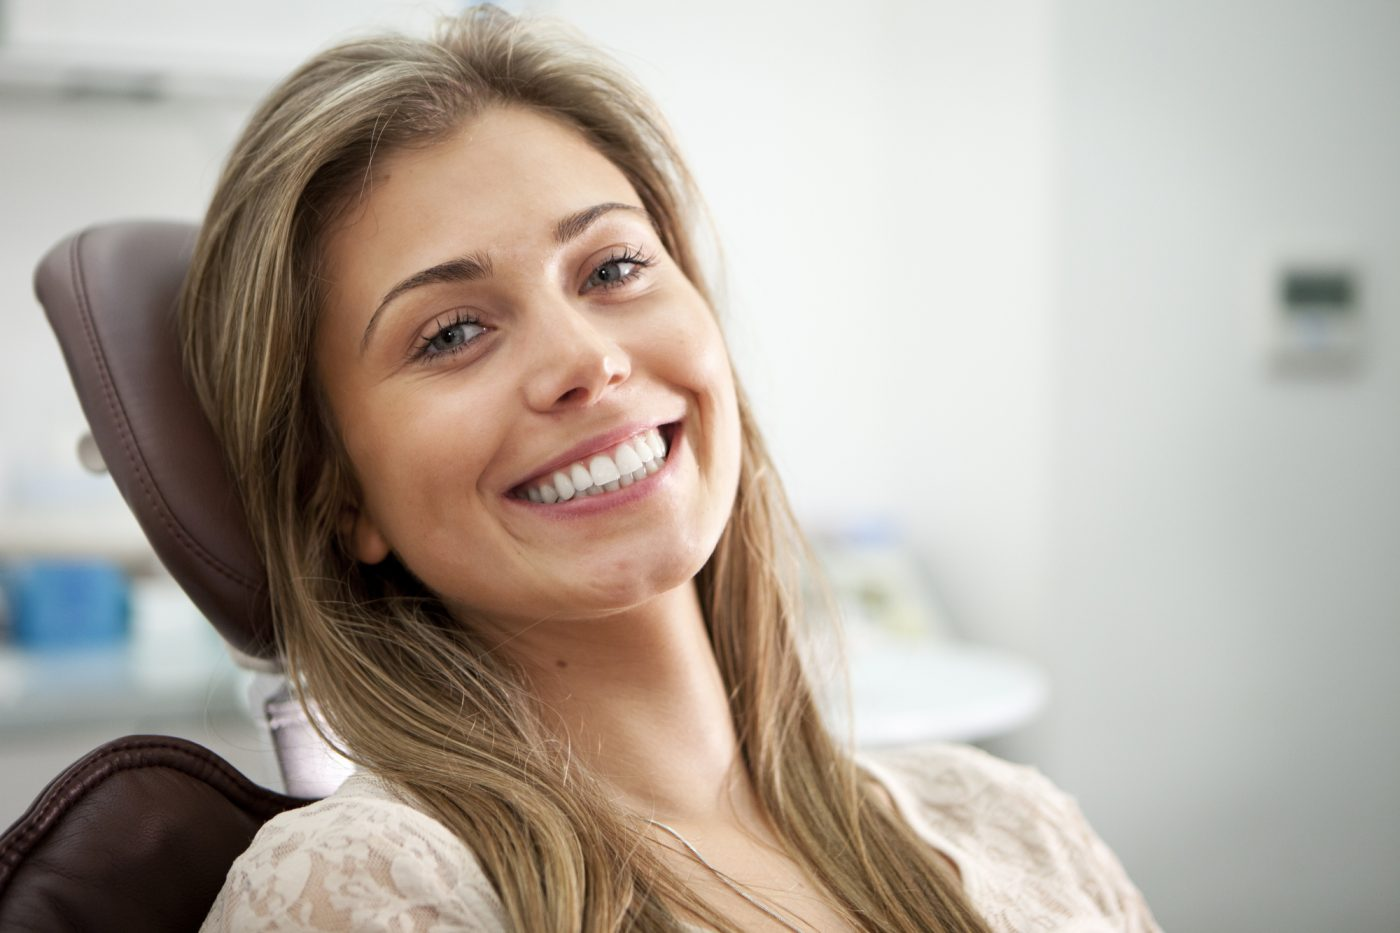 Smiles Advicecare Freshbreath